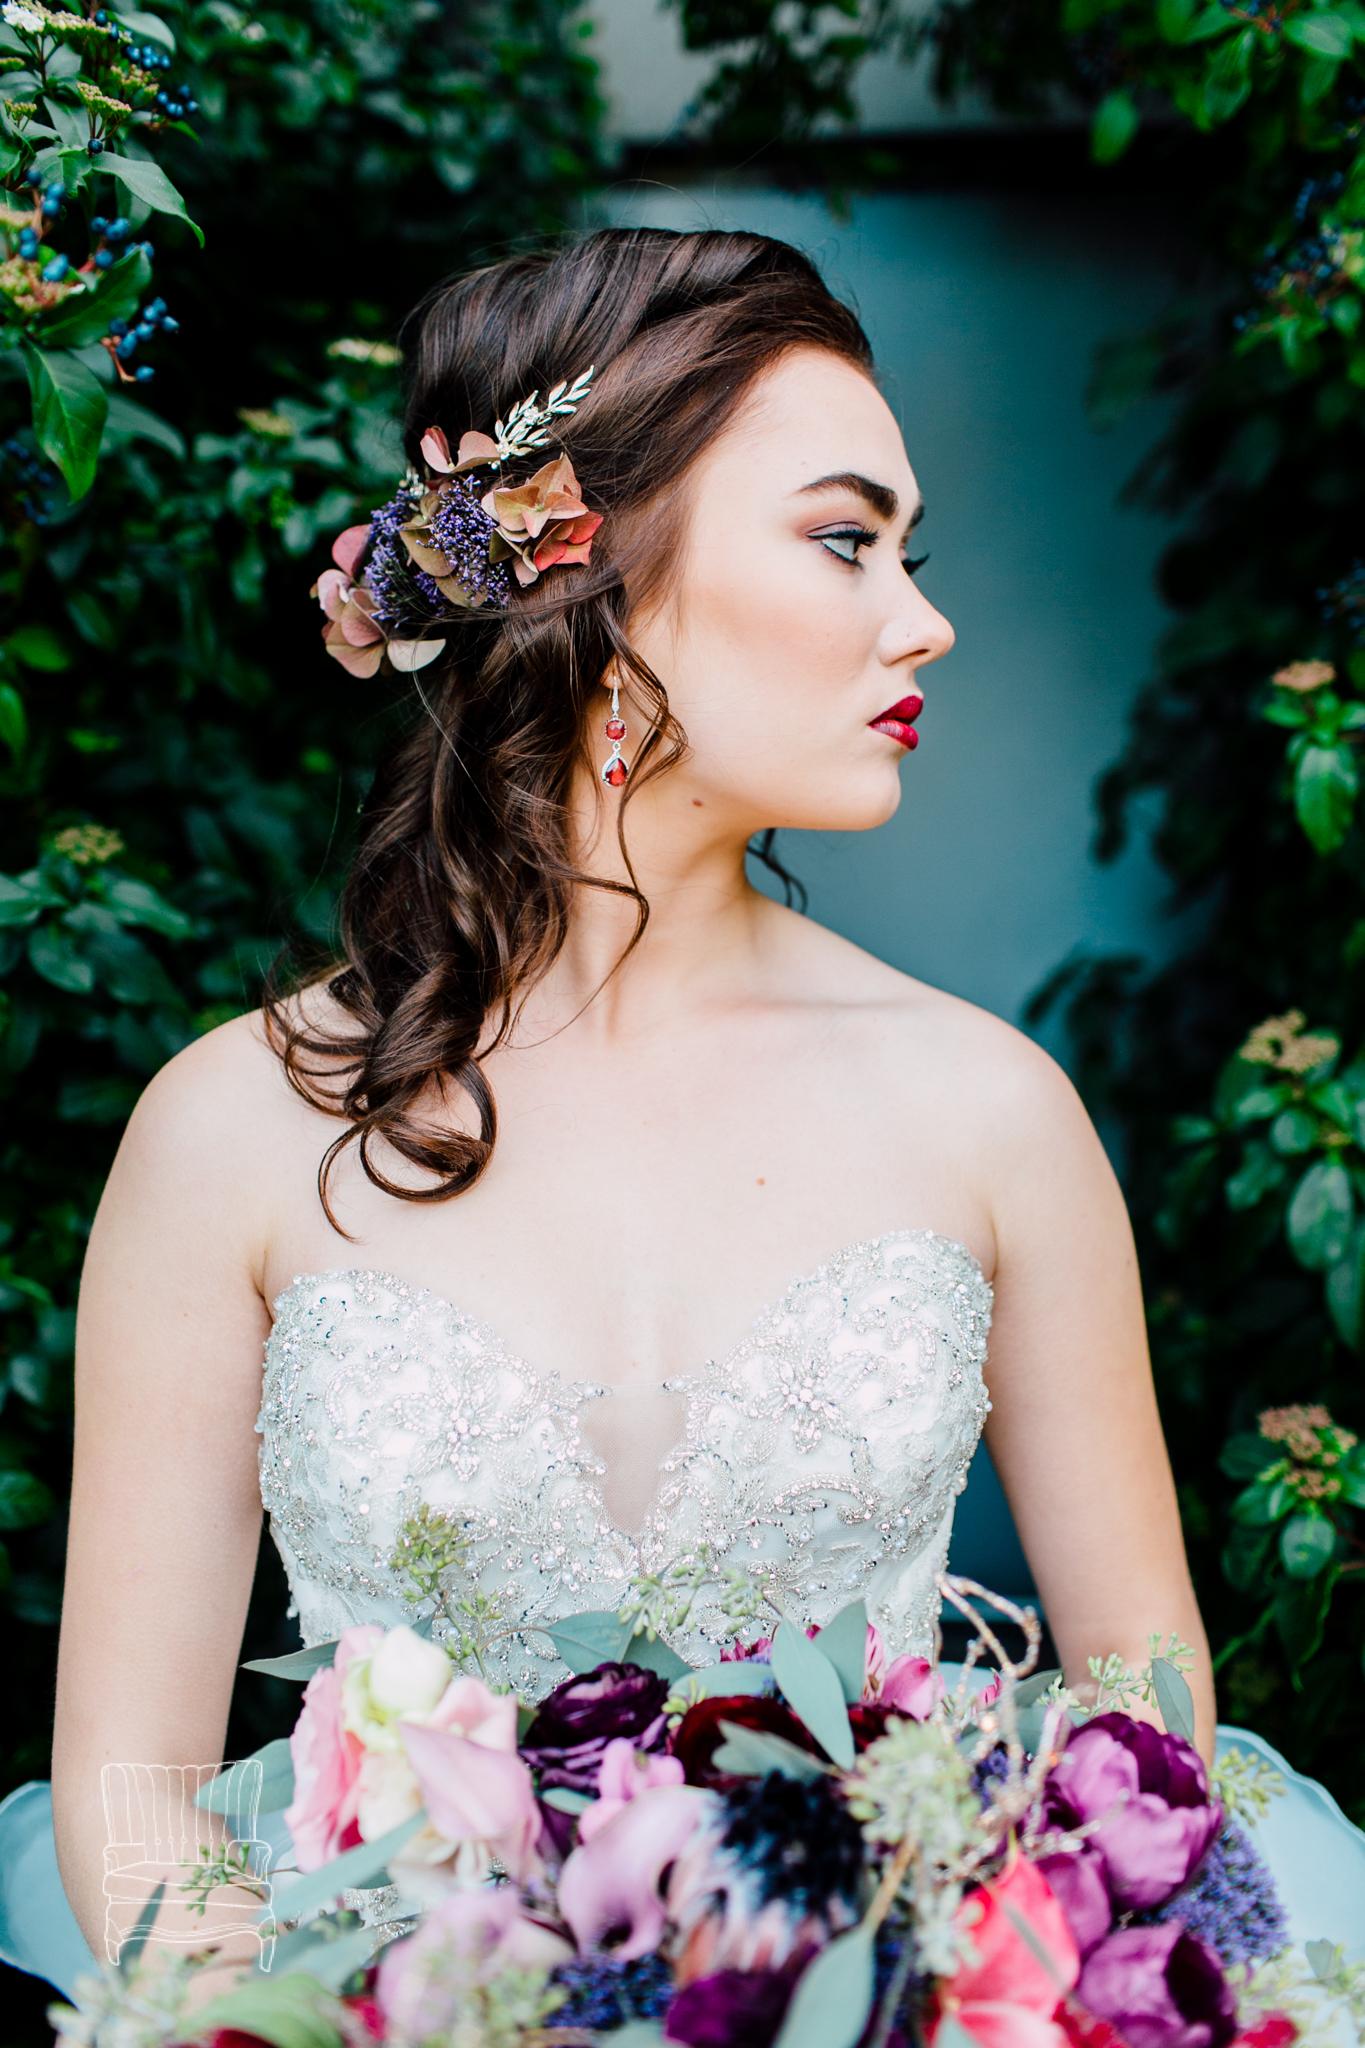 bellwether-bellingham-wedding-styled-katheryn-moran-photography-6.jpg